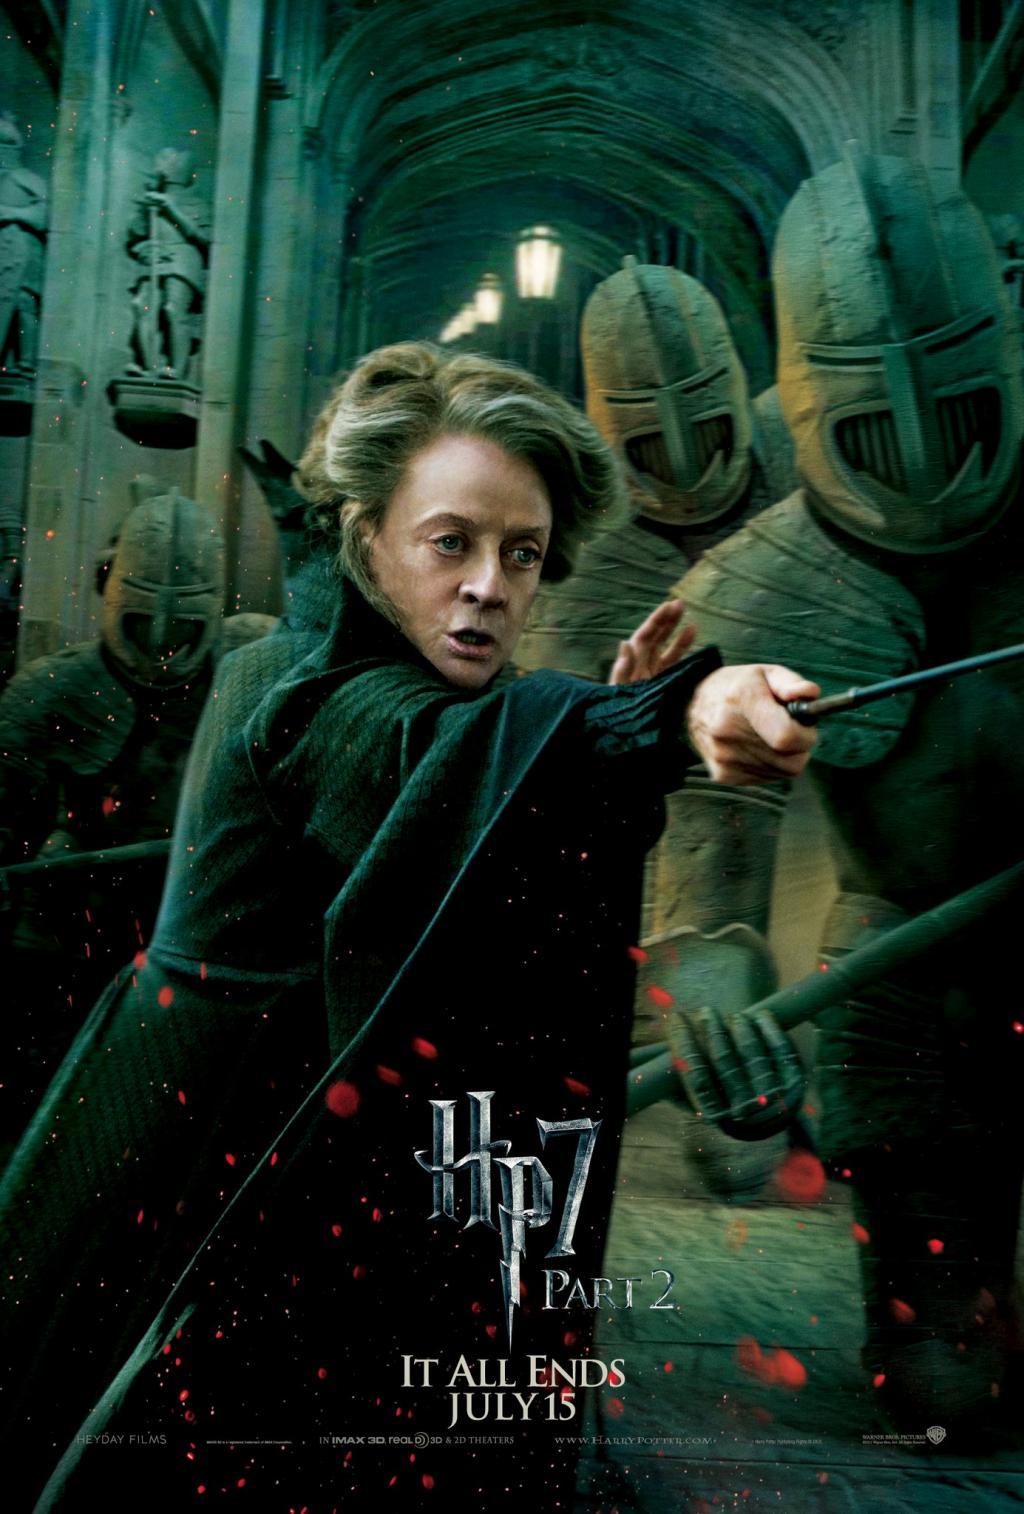 Wallpaper Harry Potter HP7 Part 2 poster - Minerva McGonagall